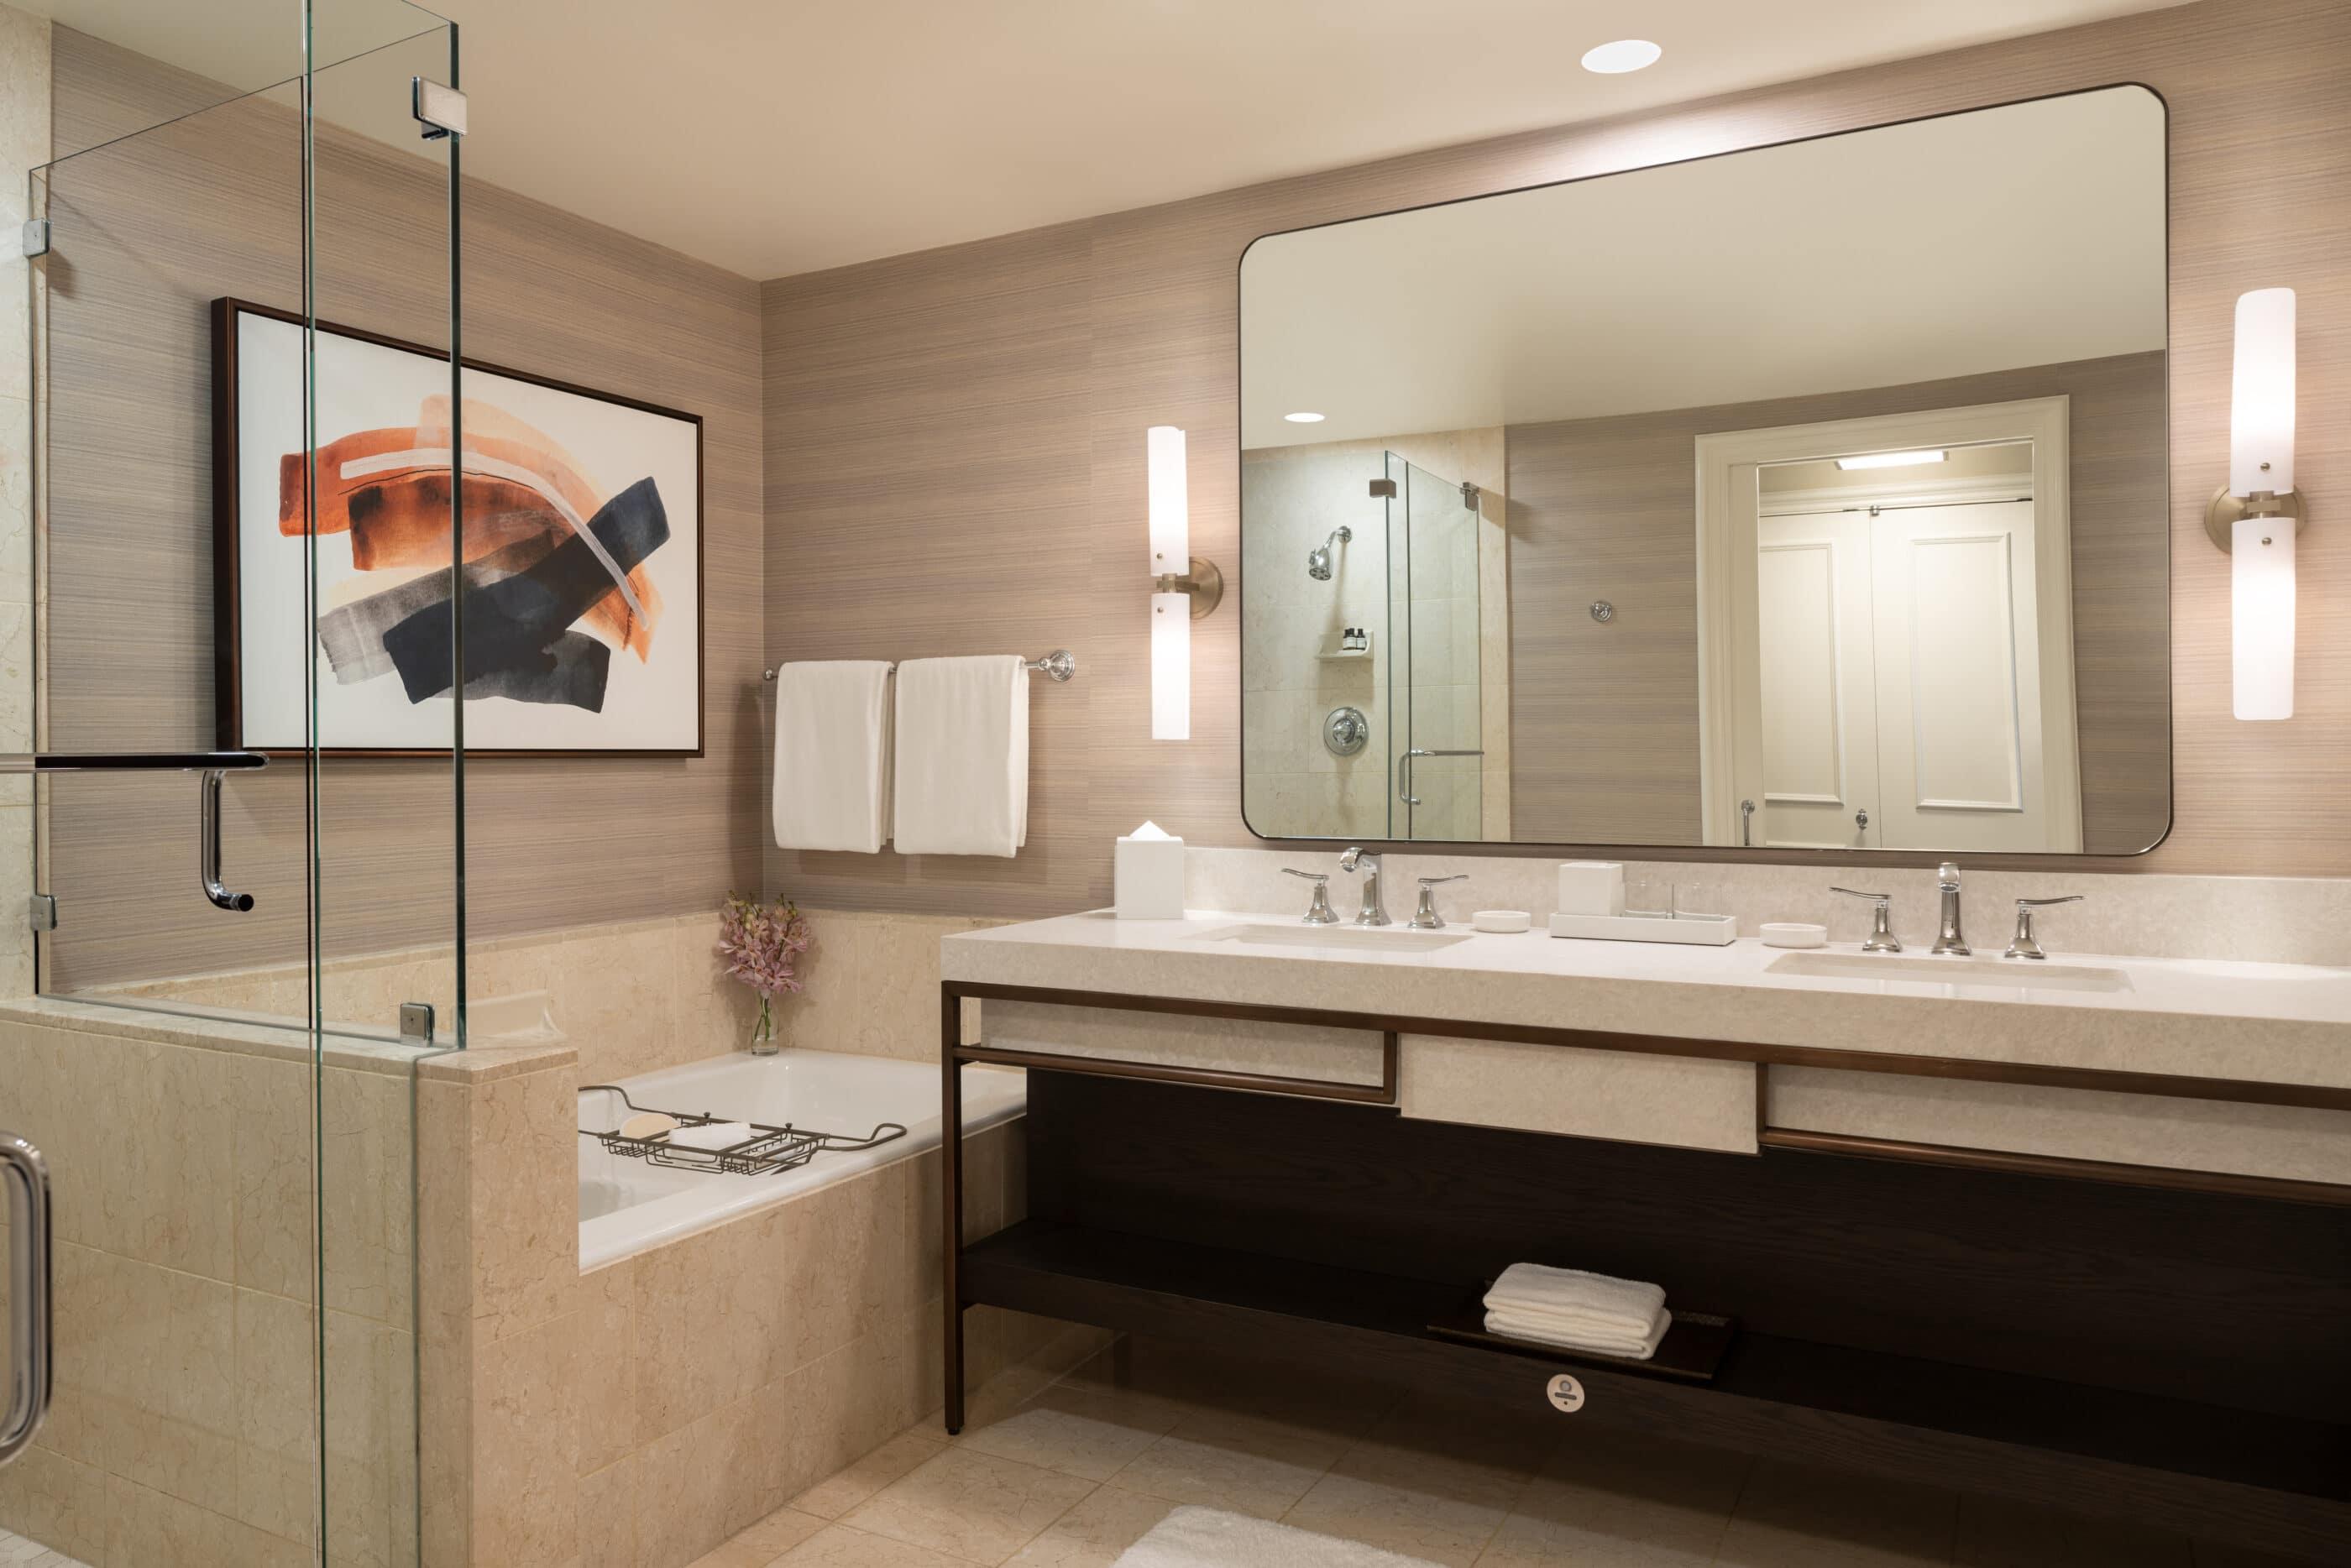 A marble bathroom in a guest room at Park Hyatt Aviara in San Diego